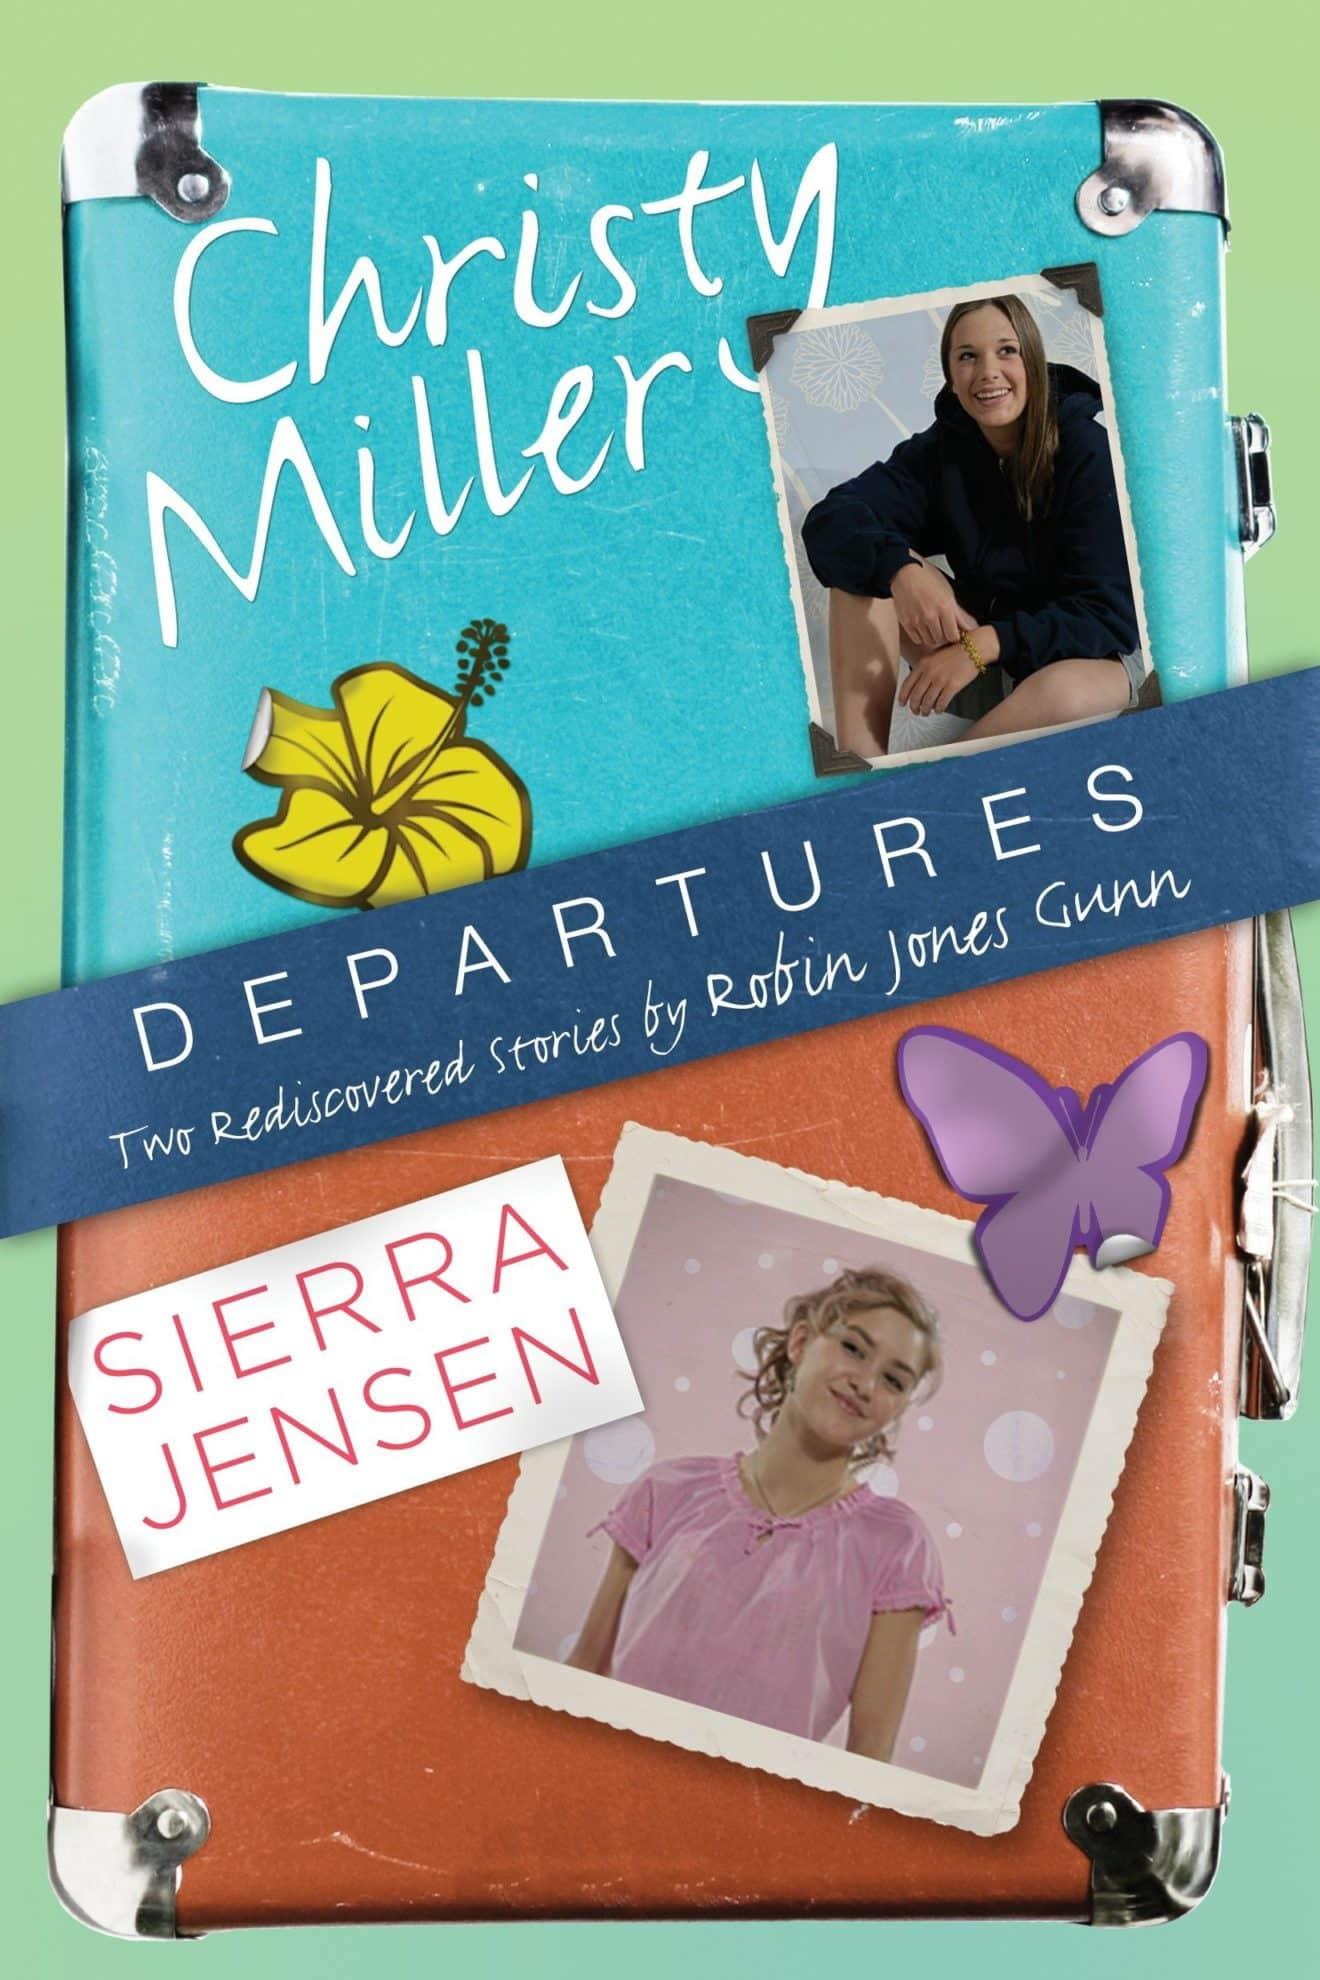 Book: Departures by Robin Jones Gunn